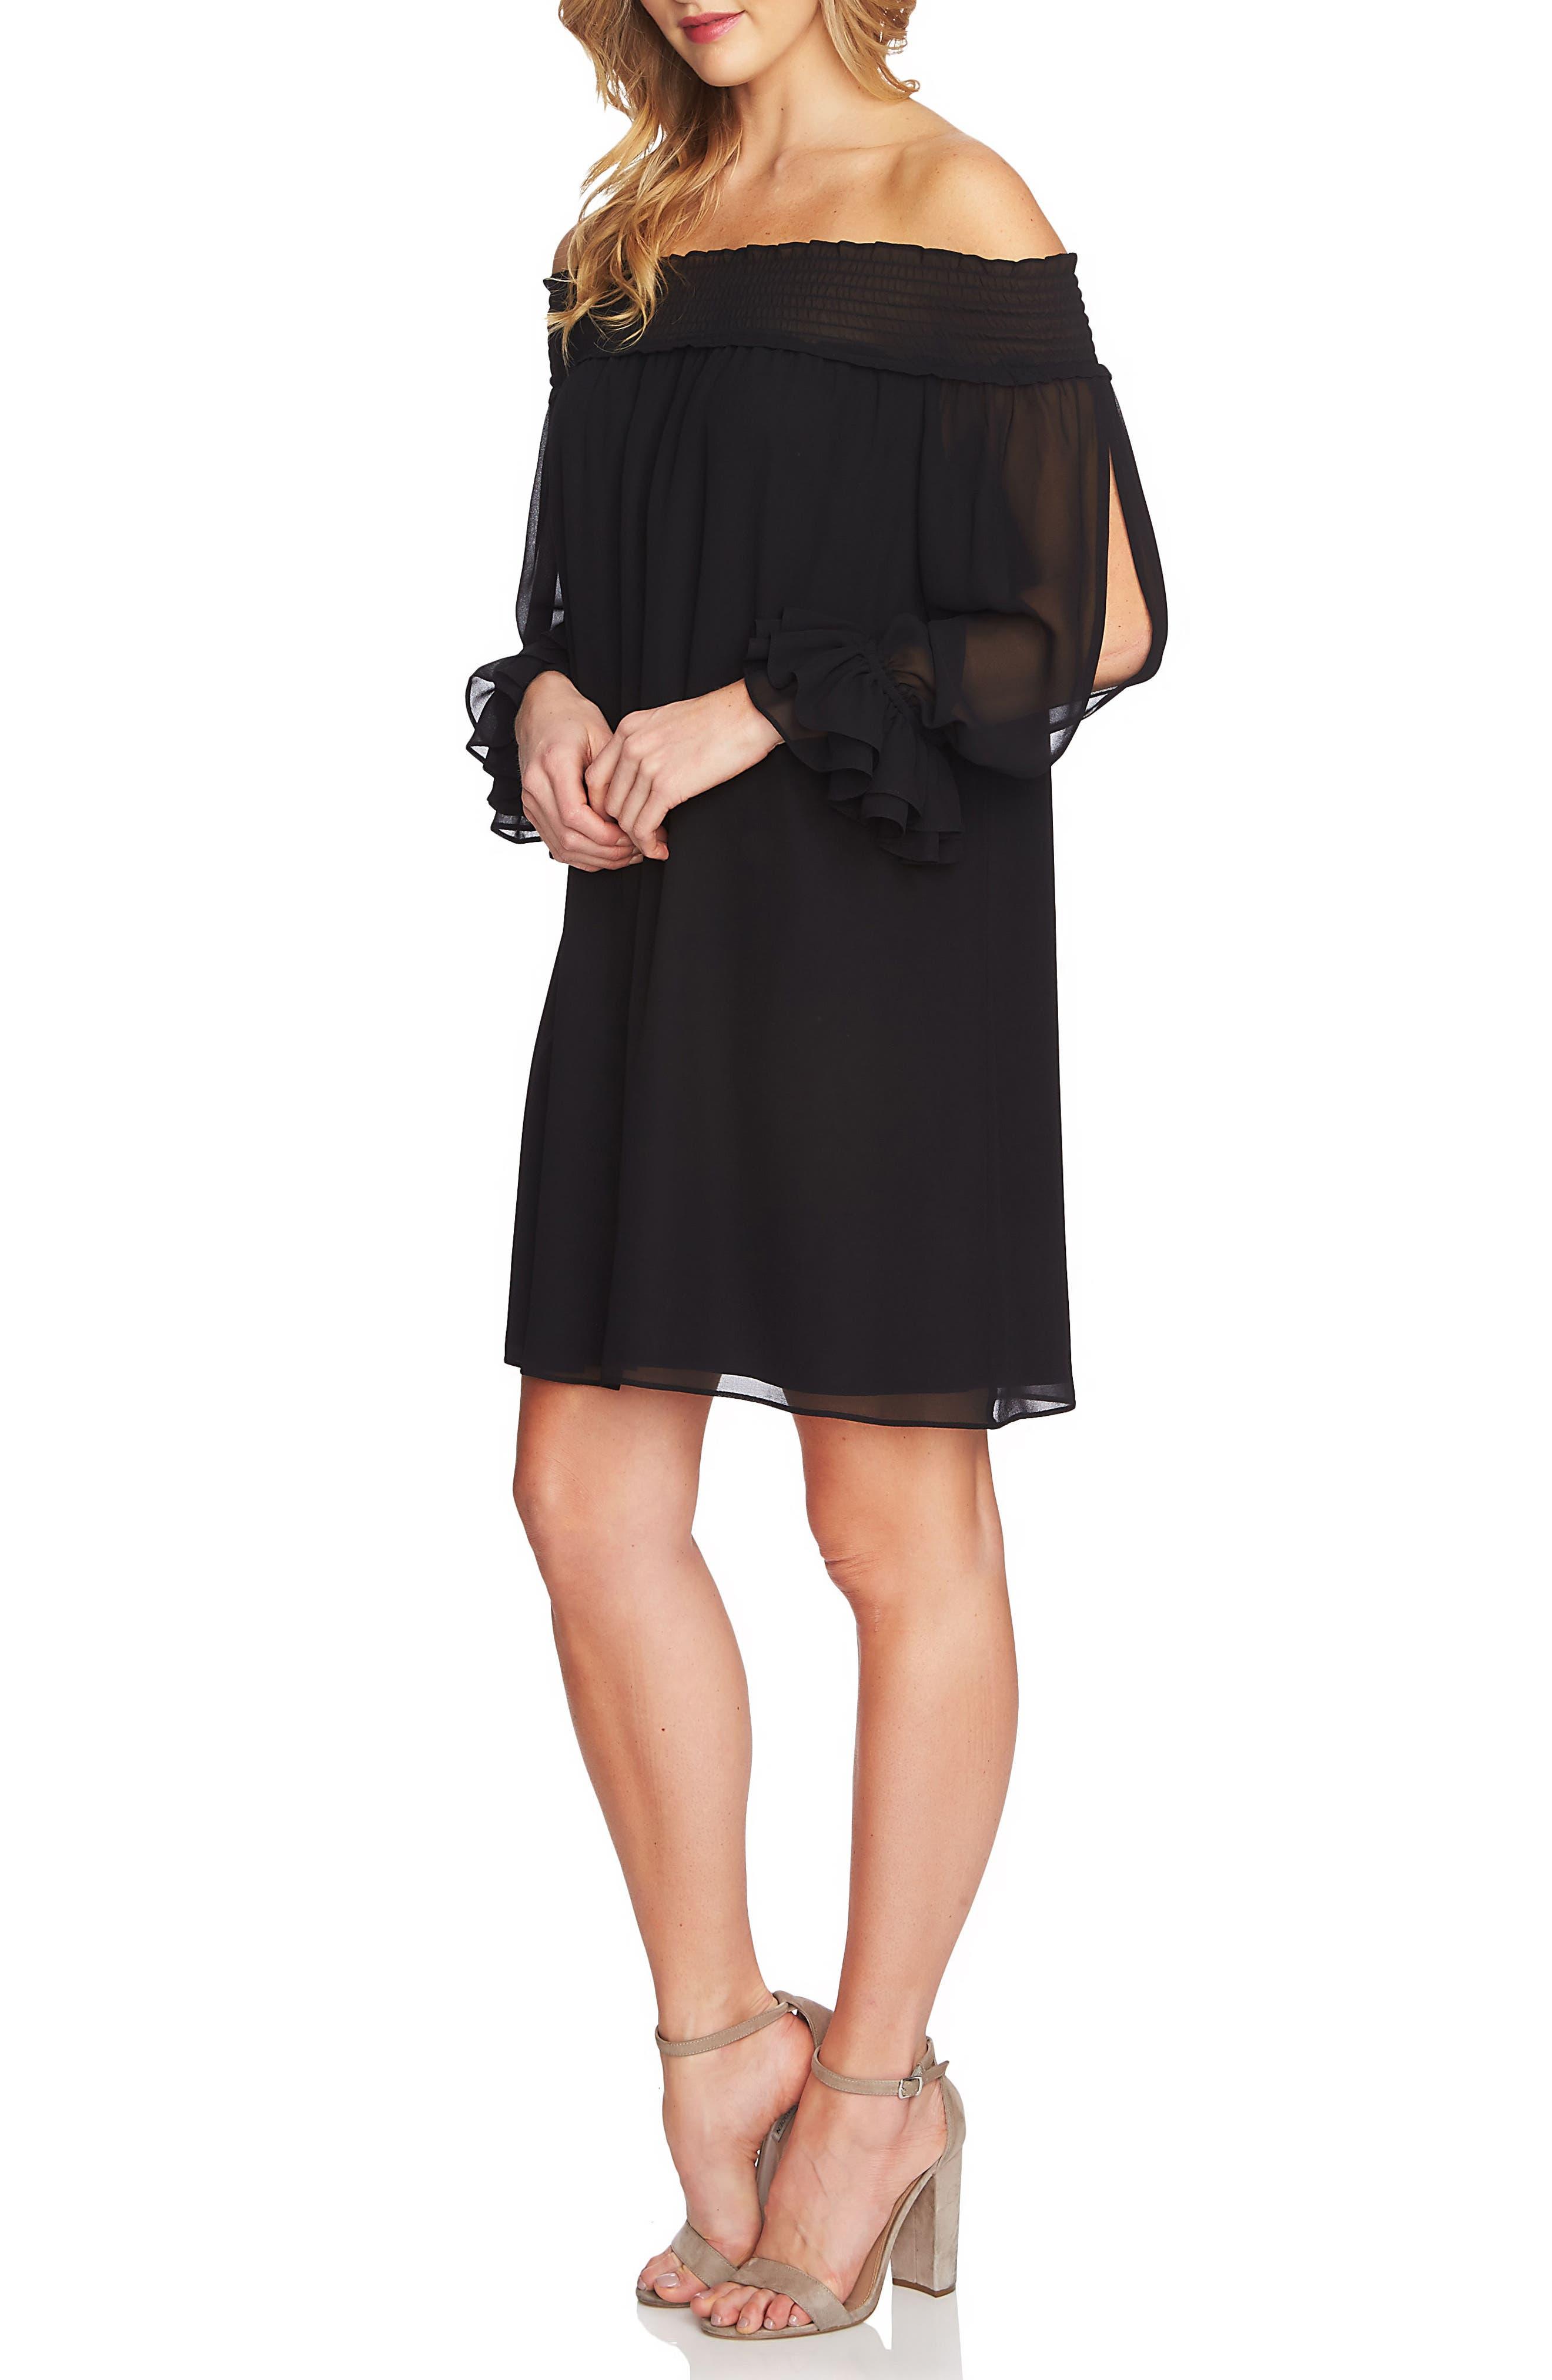 Shiloh Off the Shoulder Split Sleeve Shift Dress,                         Main,                         color, Rich Black